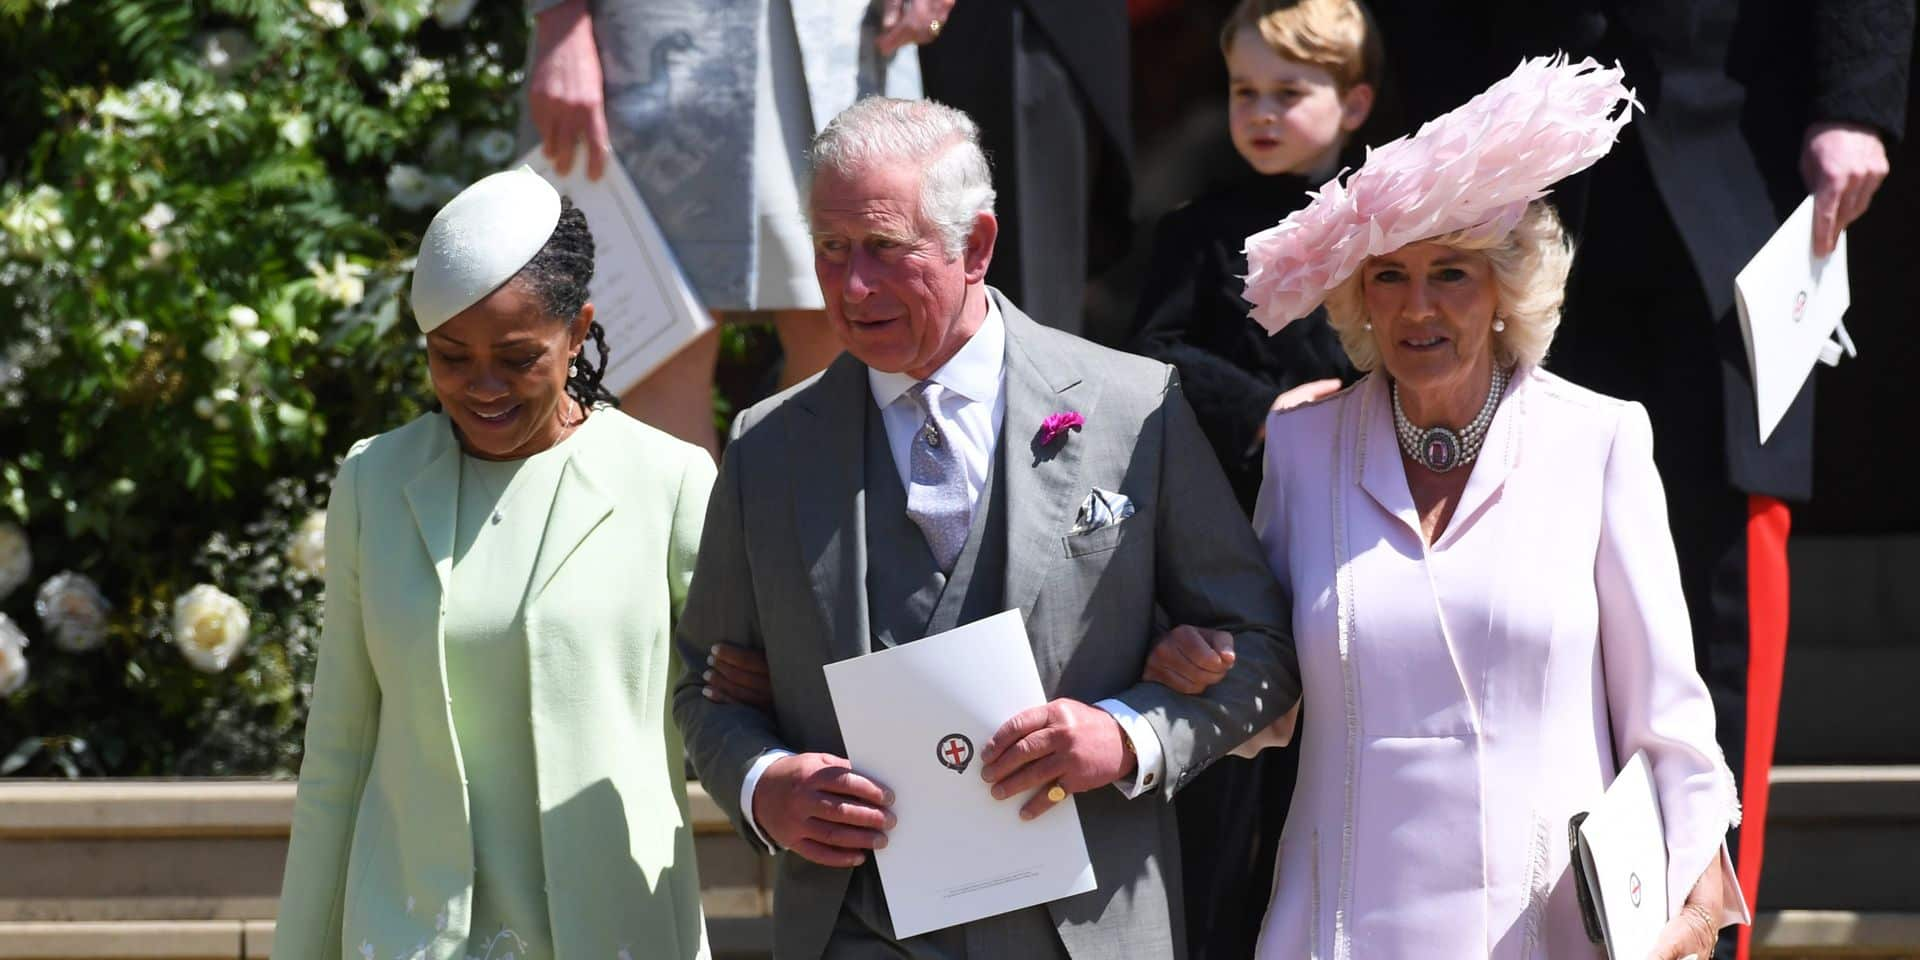 Prince Harry Marries Ms. Meghan Markle - Winsdor